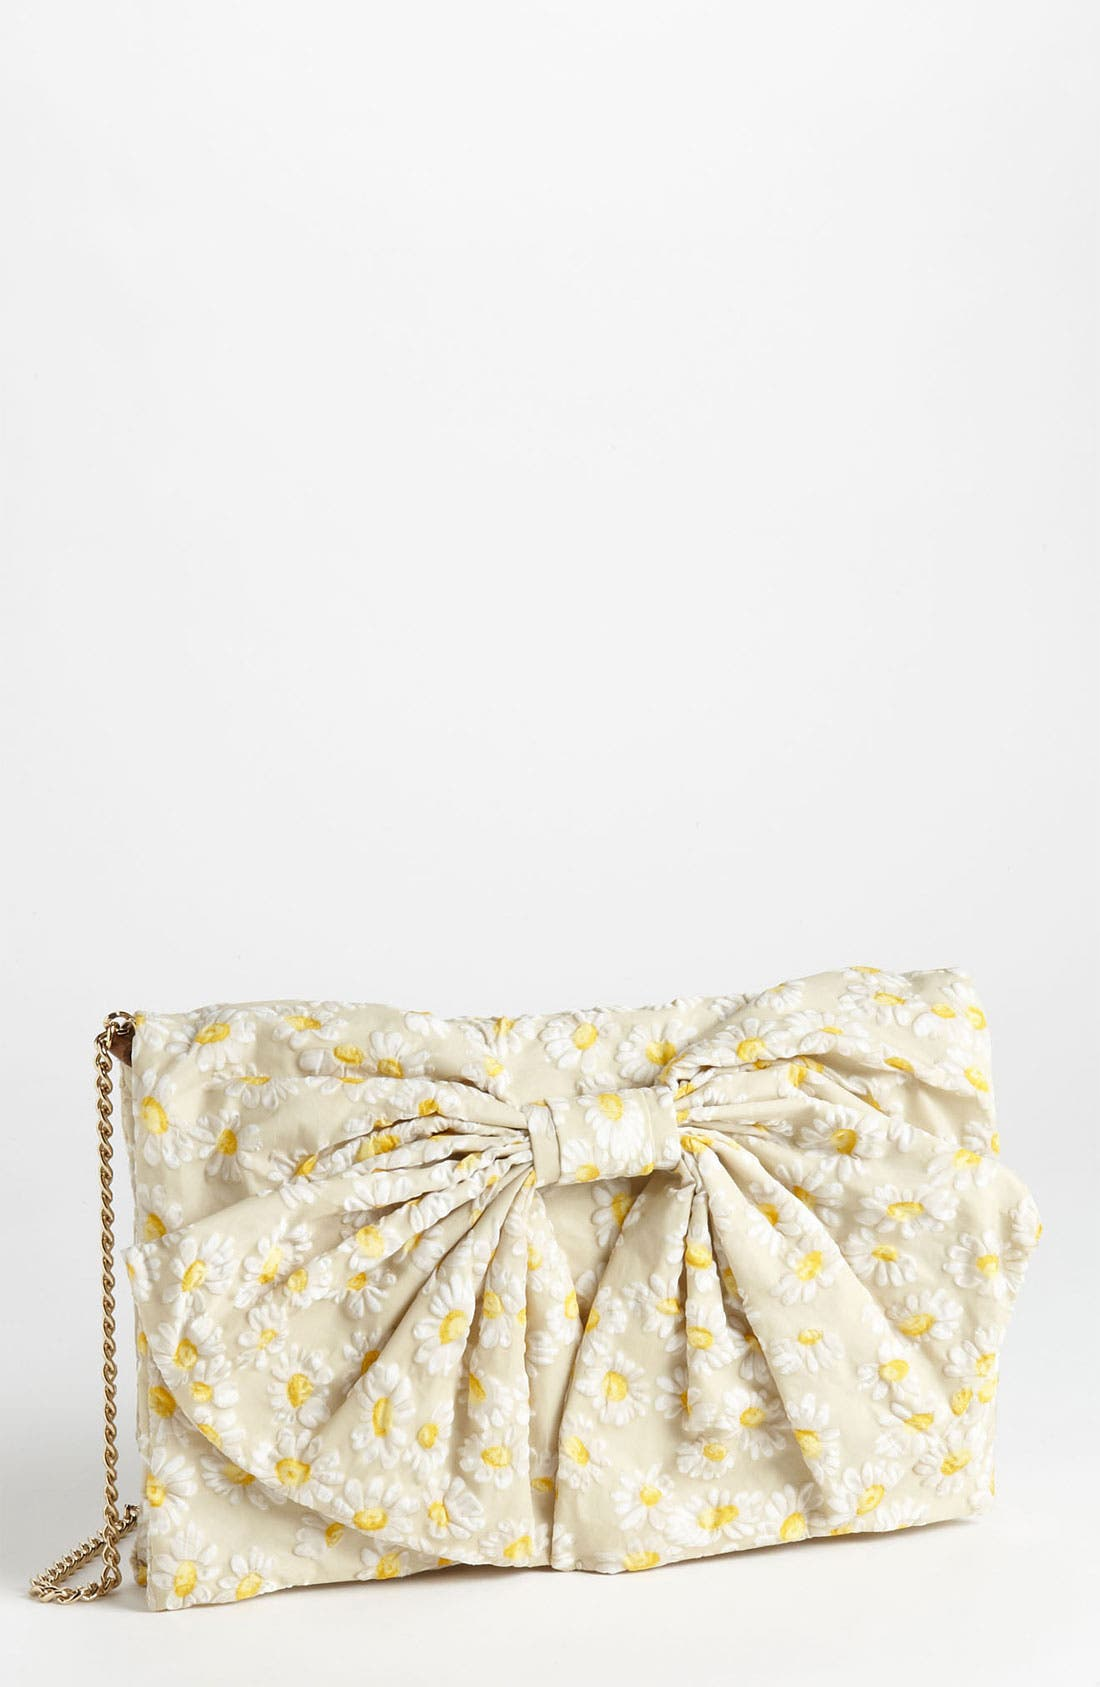 Main Image - RED Valentino 'Bow' Crossbody Bag